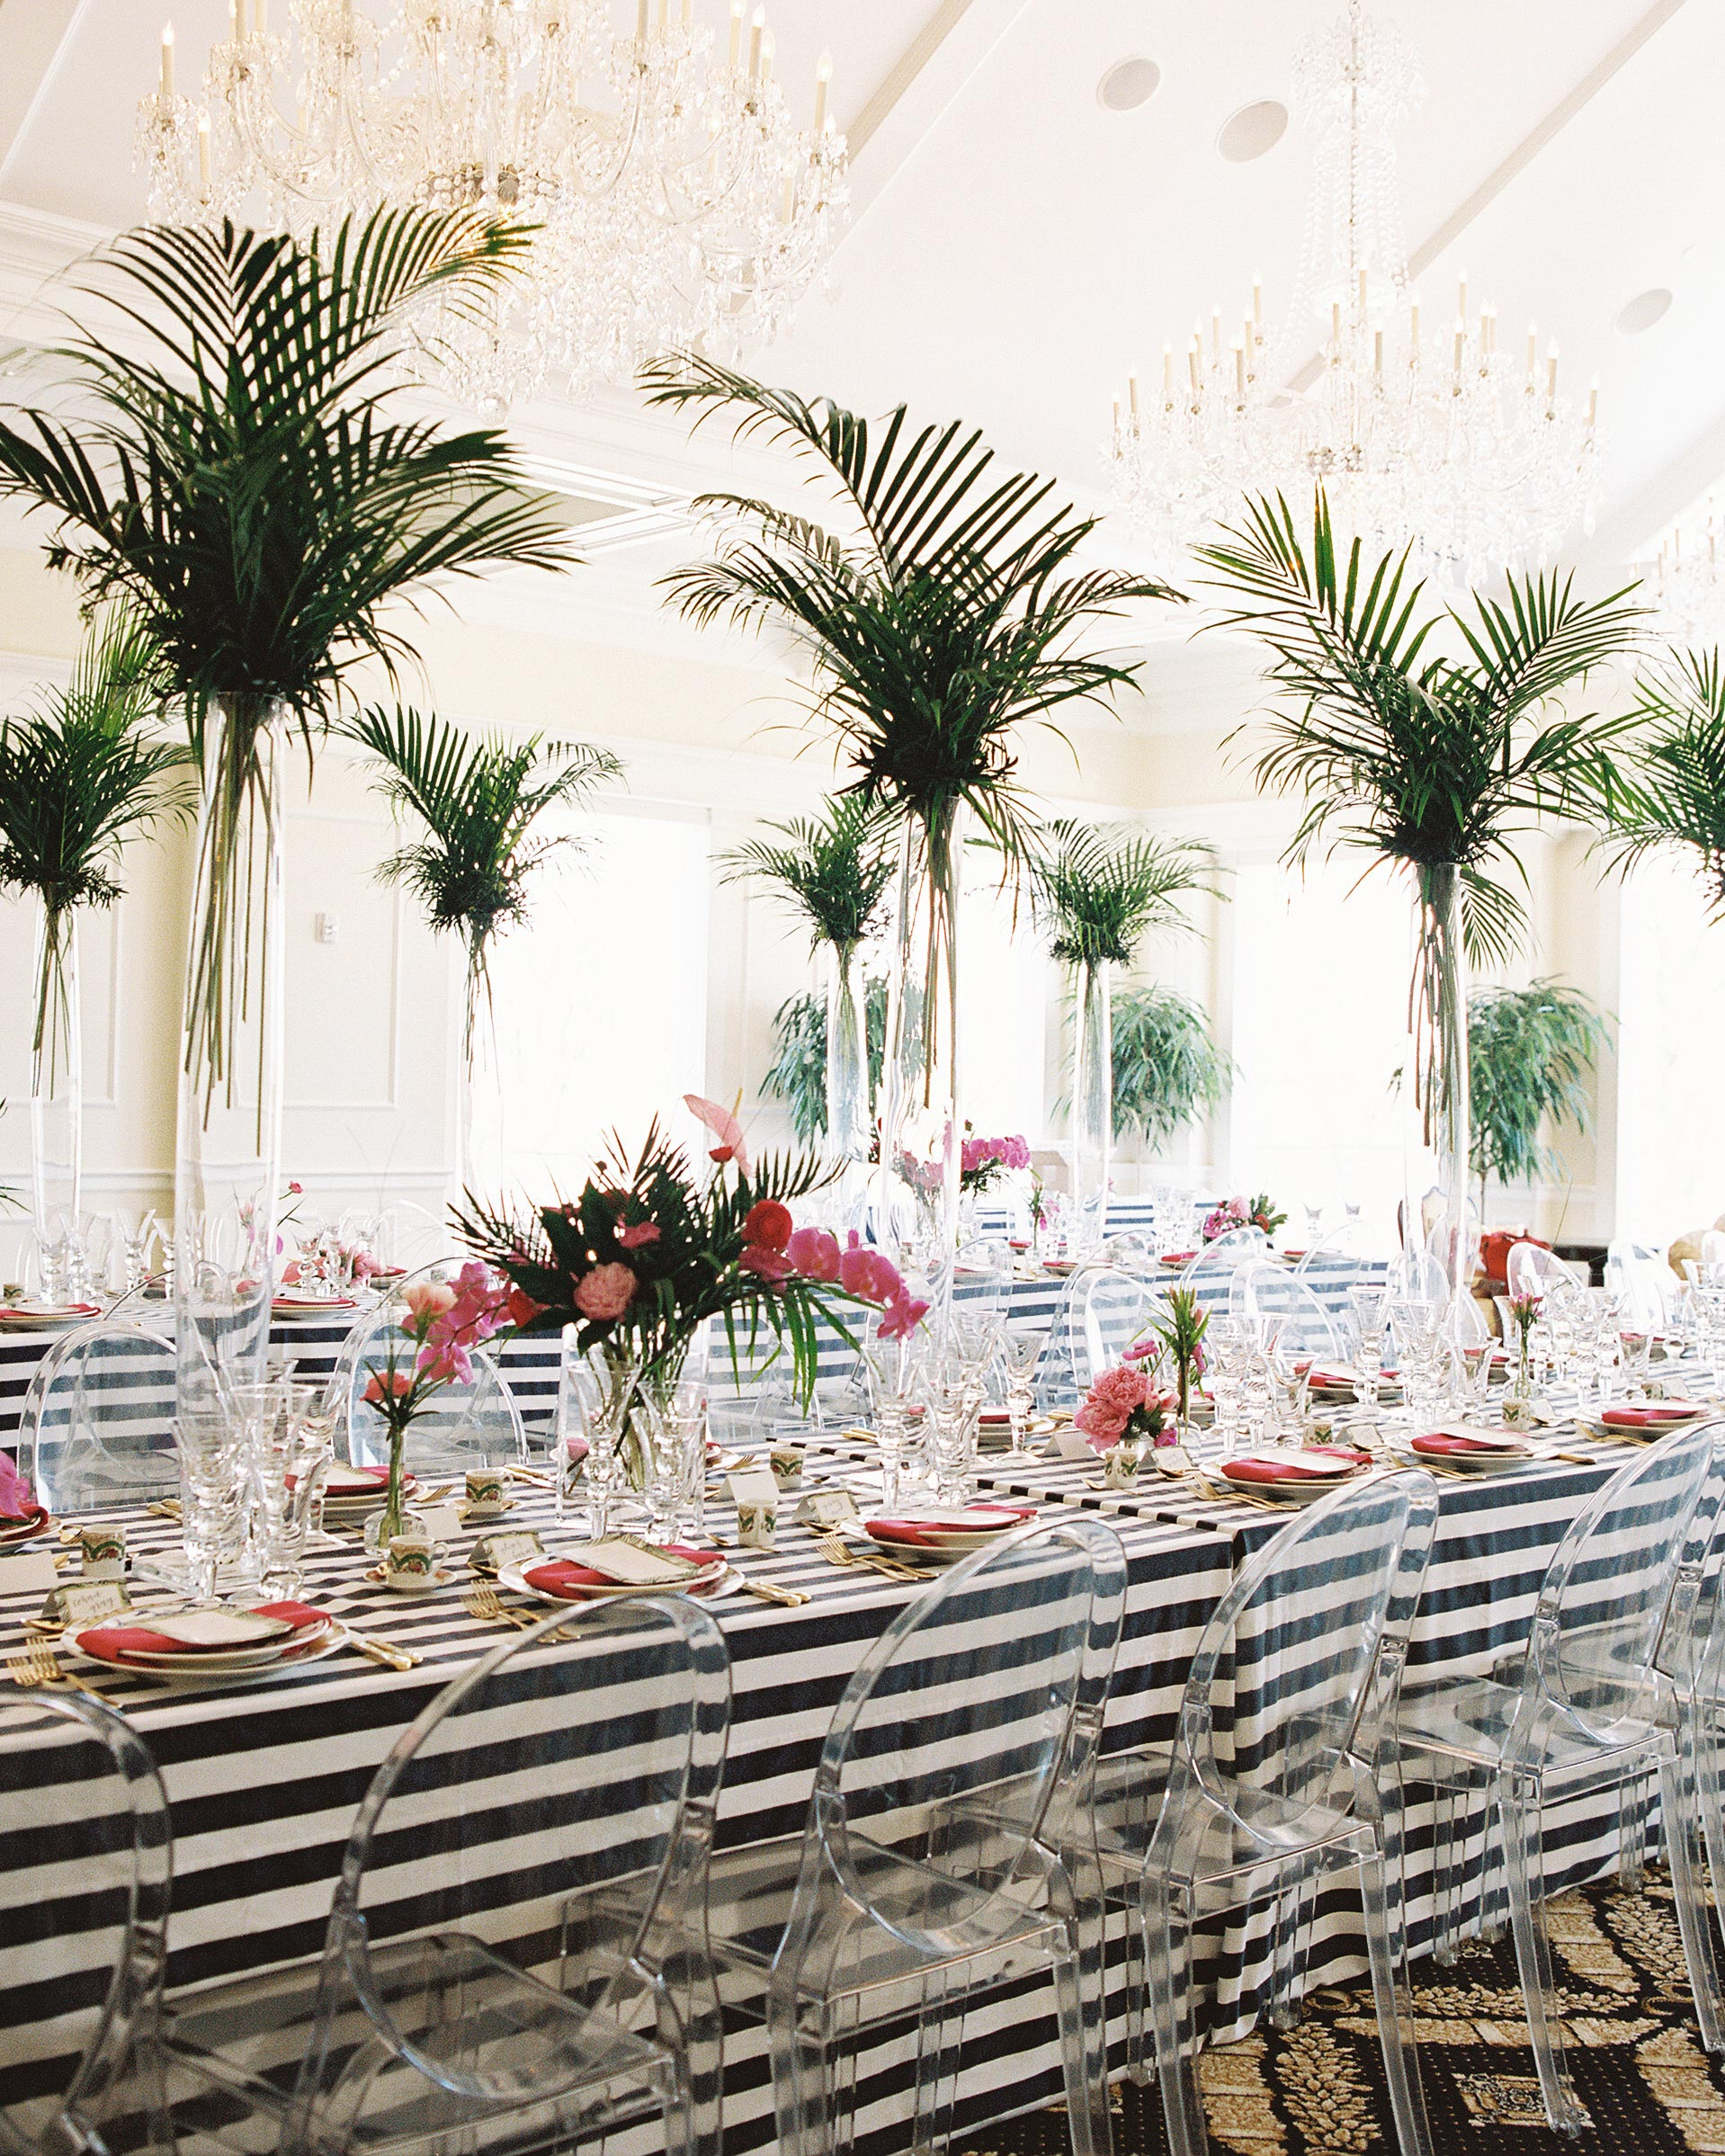 adrienne-bridal-shower-tables-7-6134175-0716.jpg